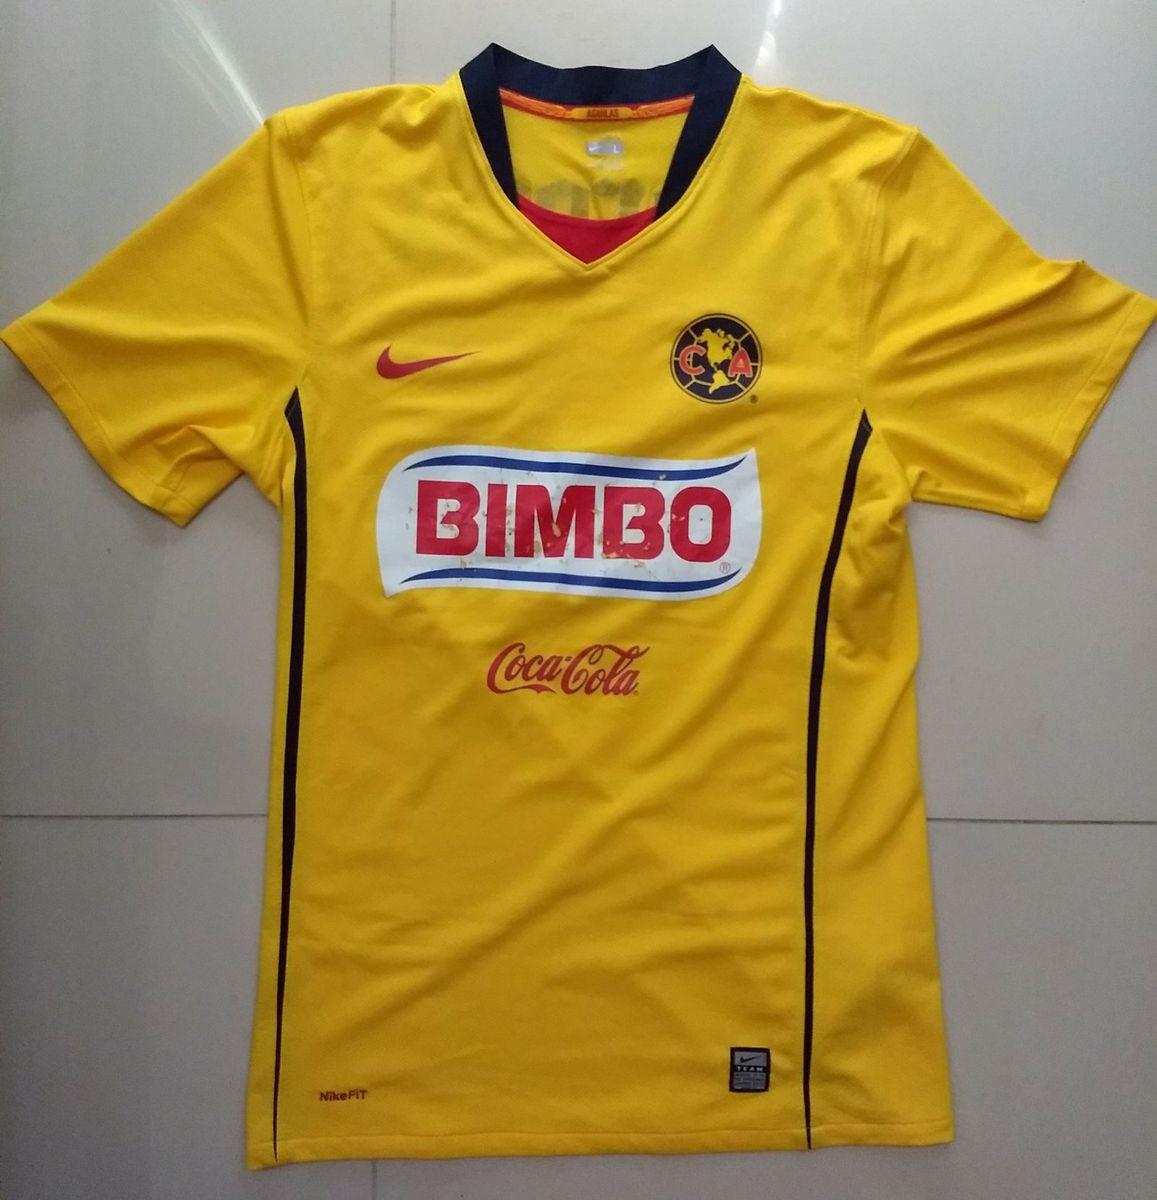 camisa américa do méxico 2008 - esportes nike.  Czm6ly9wag90b3muzw5qb2vplmnvbs5ici9wcm9kdwn0cy84ota4ndkzlzk5njm1zdlhmgewzjgxnzq5mjq5ytlmntnjn2qxmtnllmpwzw  ... 71a17d875c3e4